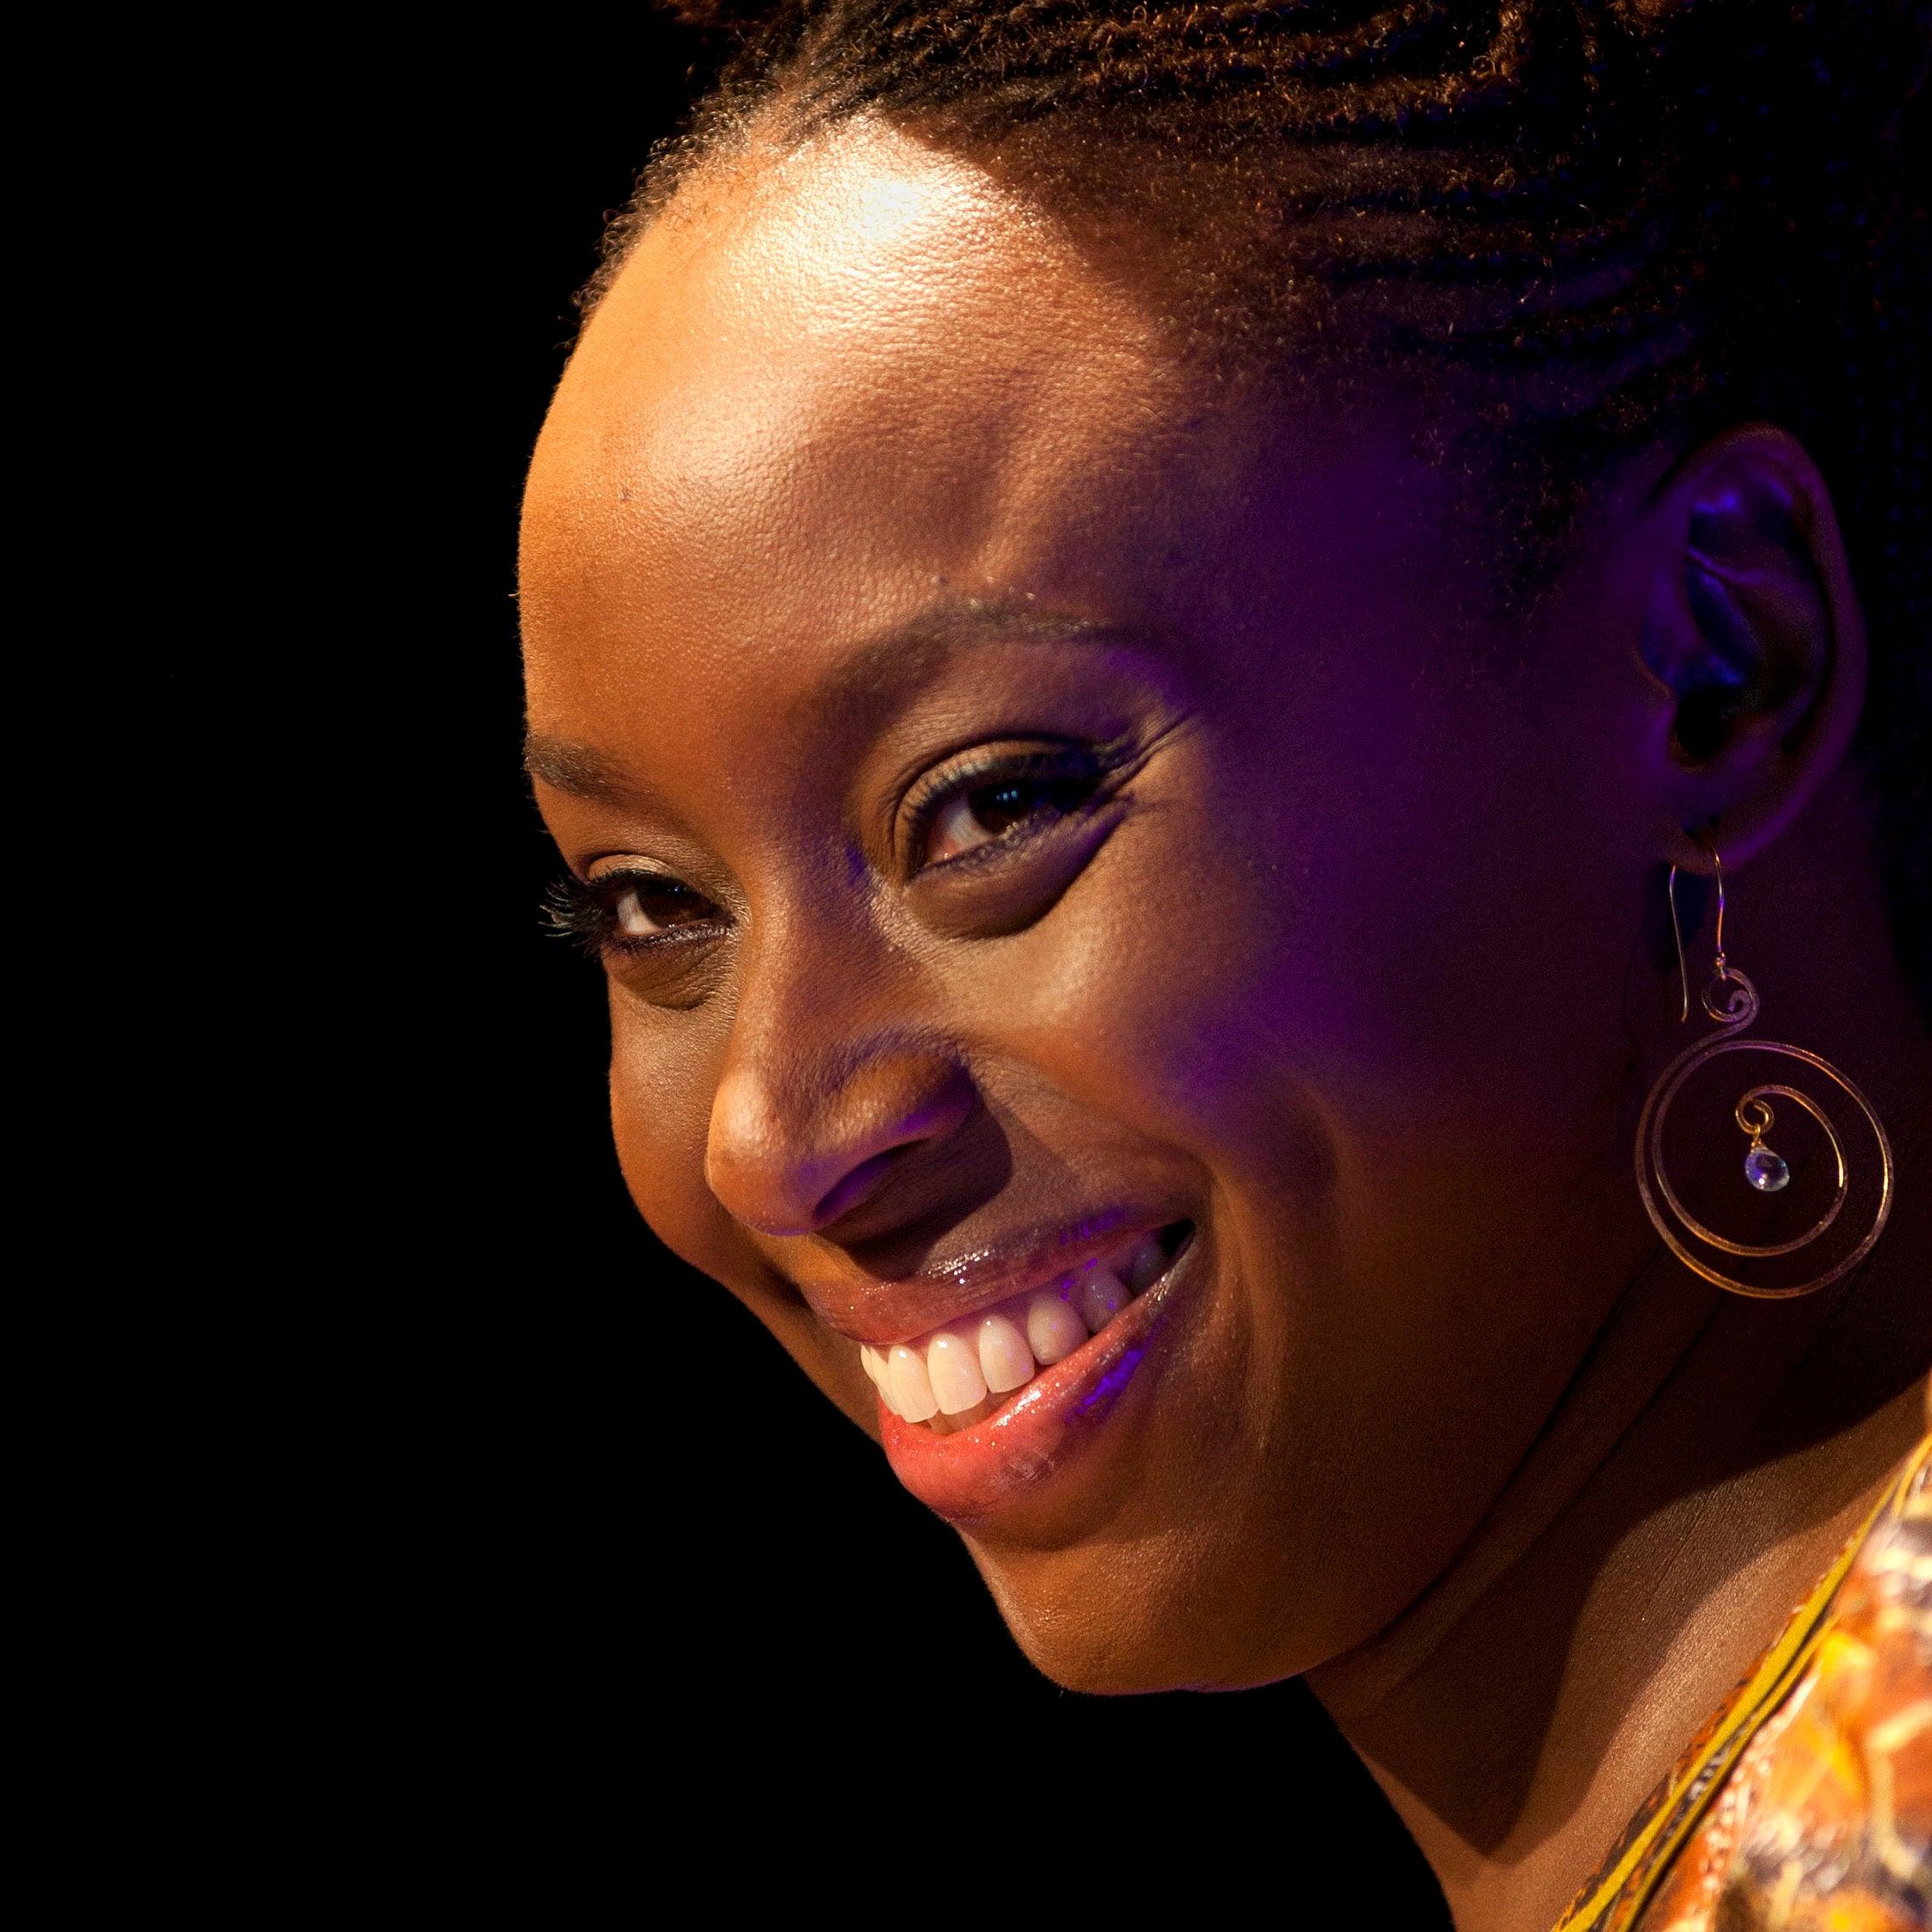 Chimamanda Ngozi Adichie On Police Killings In America: 'Language Has Escaped Me'